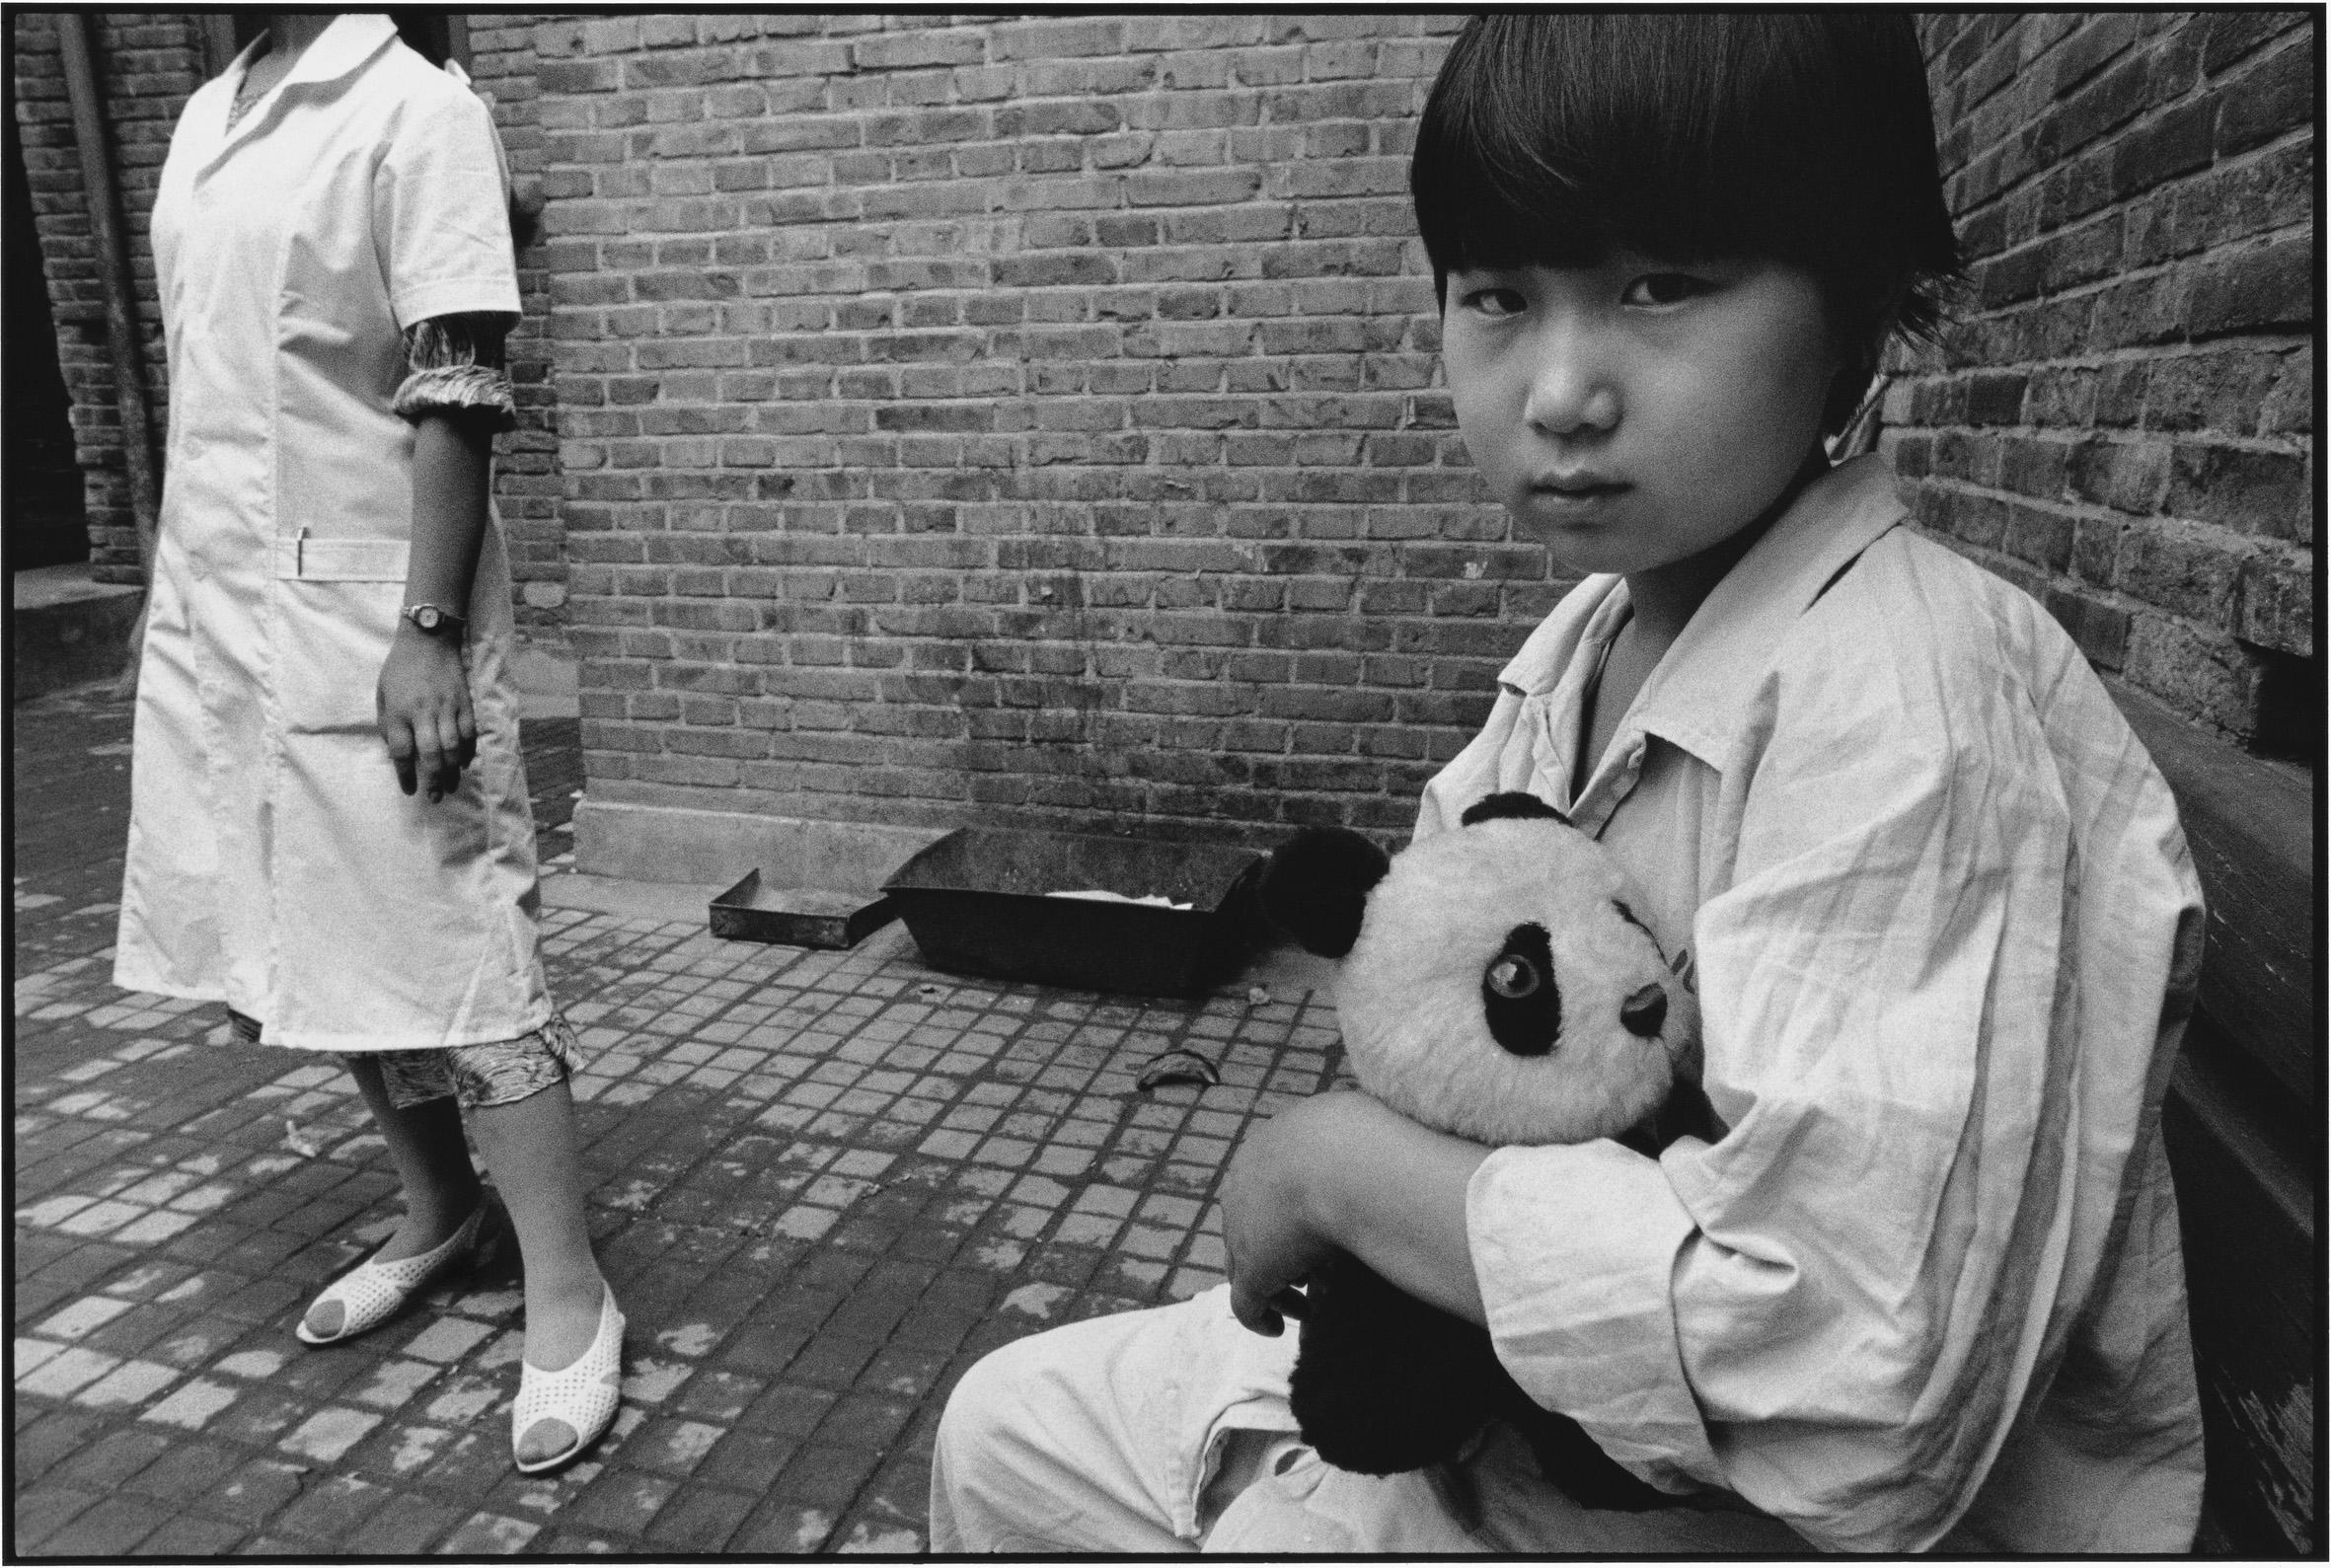 Mental Hospital, Beijing, China